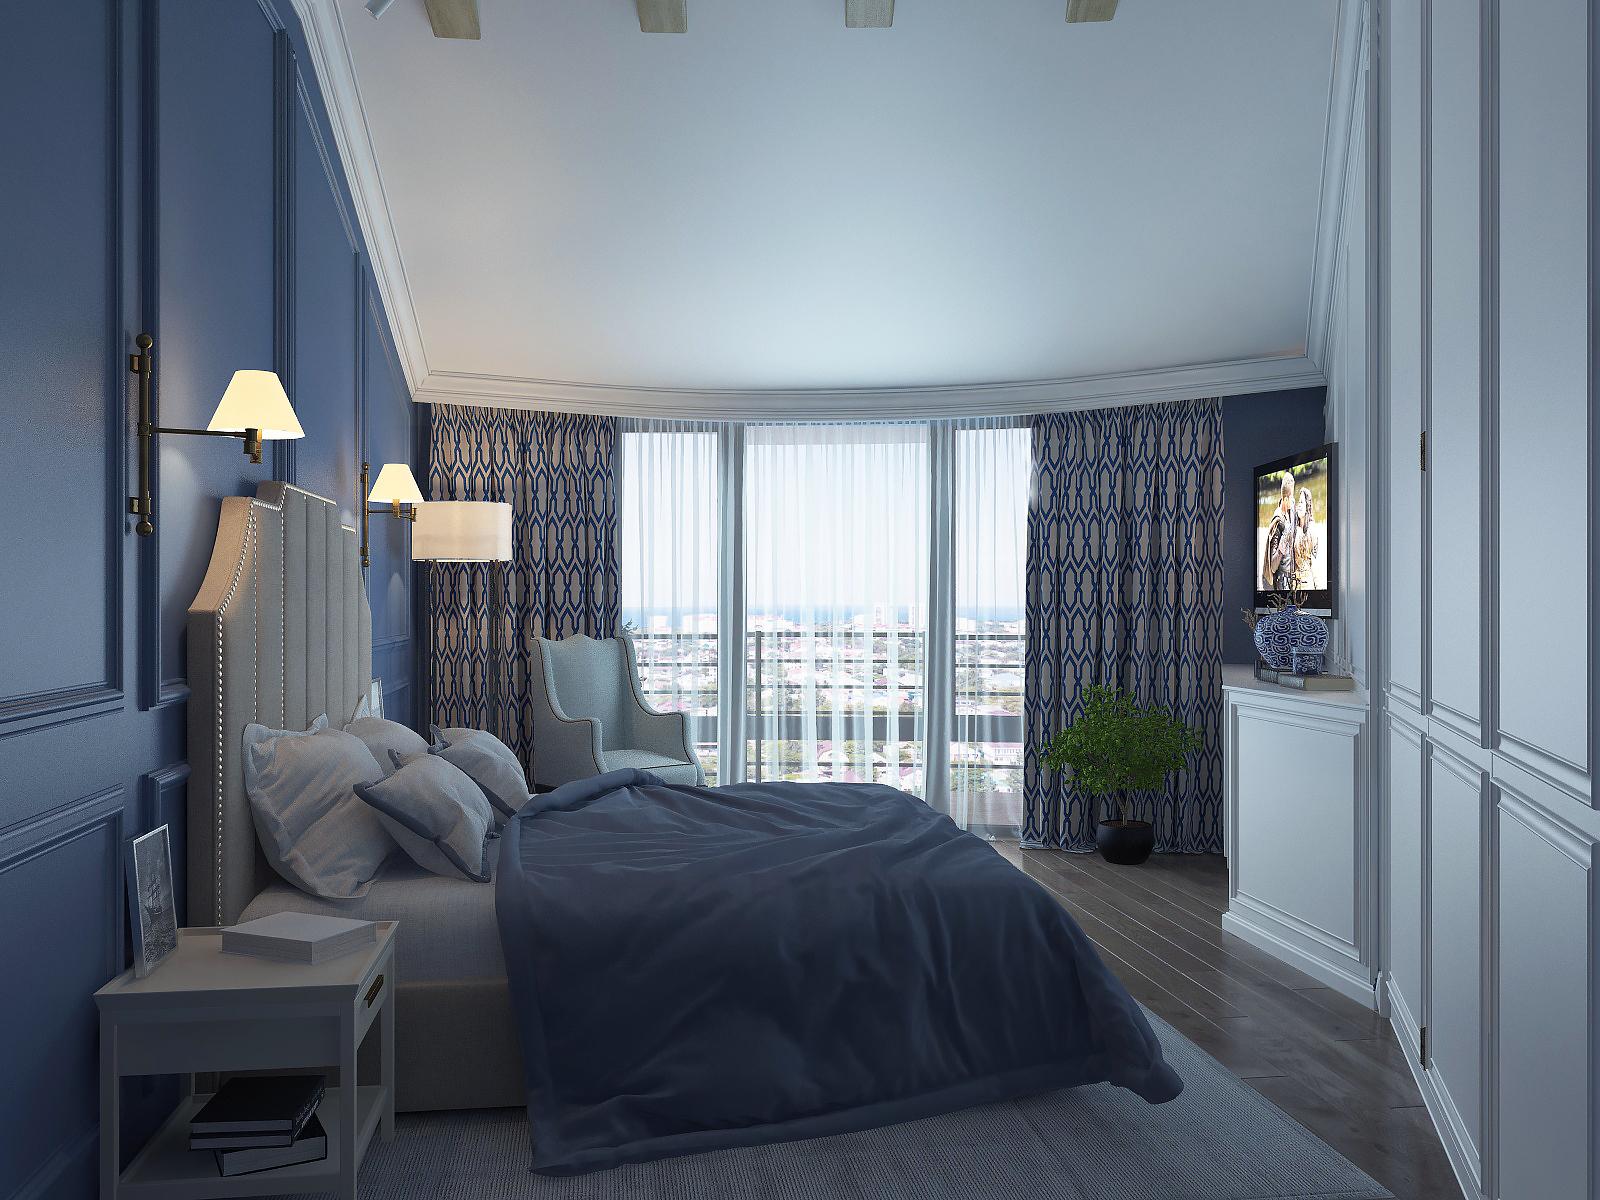 ANAPA_bedroom_11